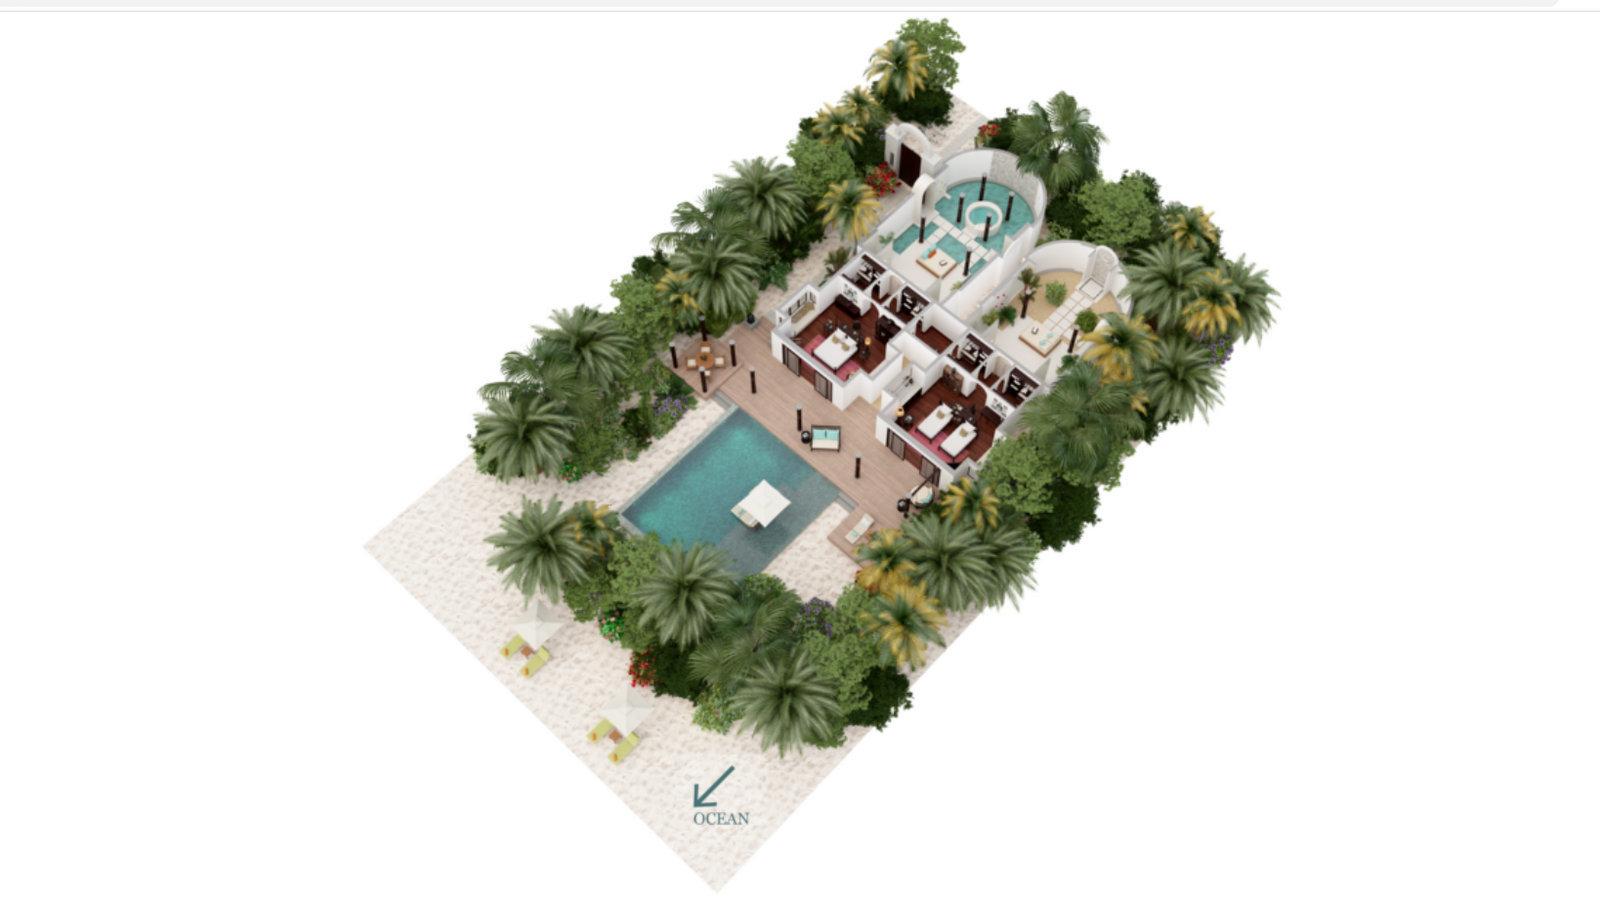 Мальдивы, отель Anantara Kihavah Maldives Villas, план-схема номера Family Beach Pool Villa